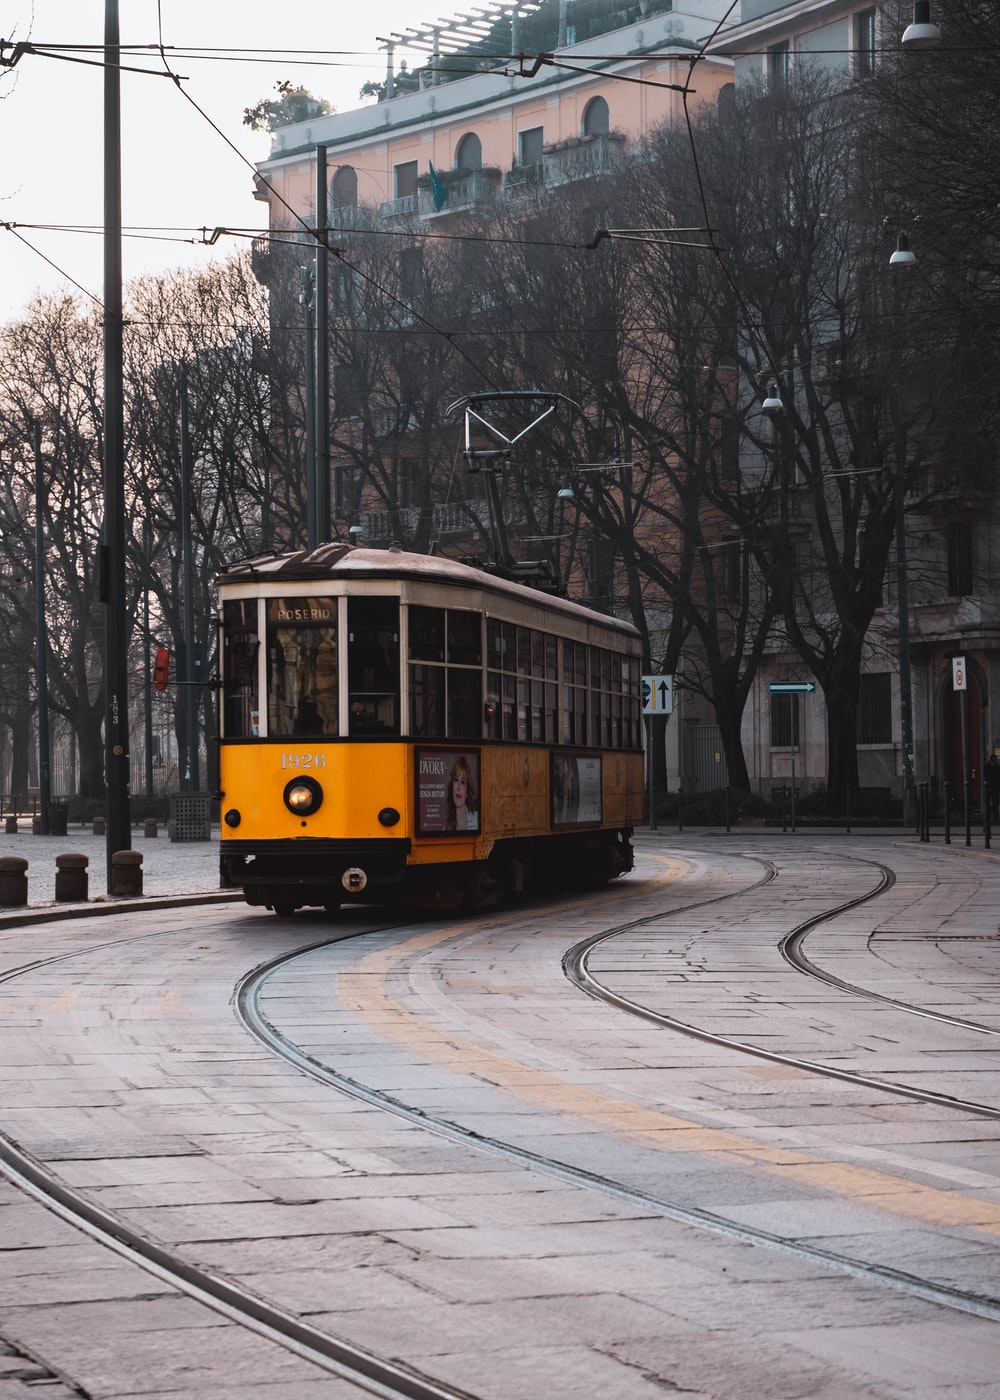 yellow tram crossing rail beside bare trees